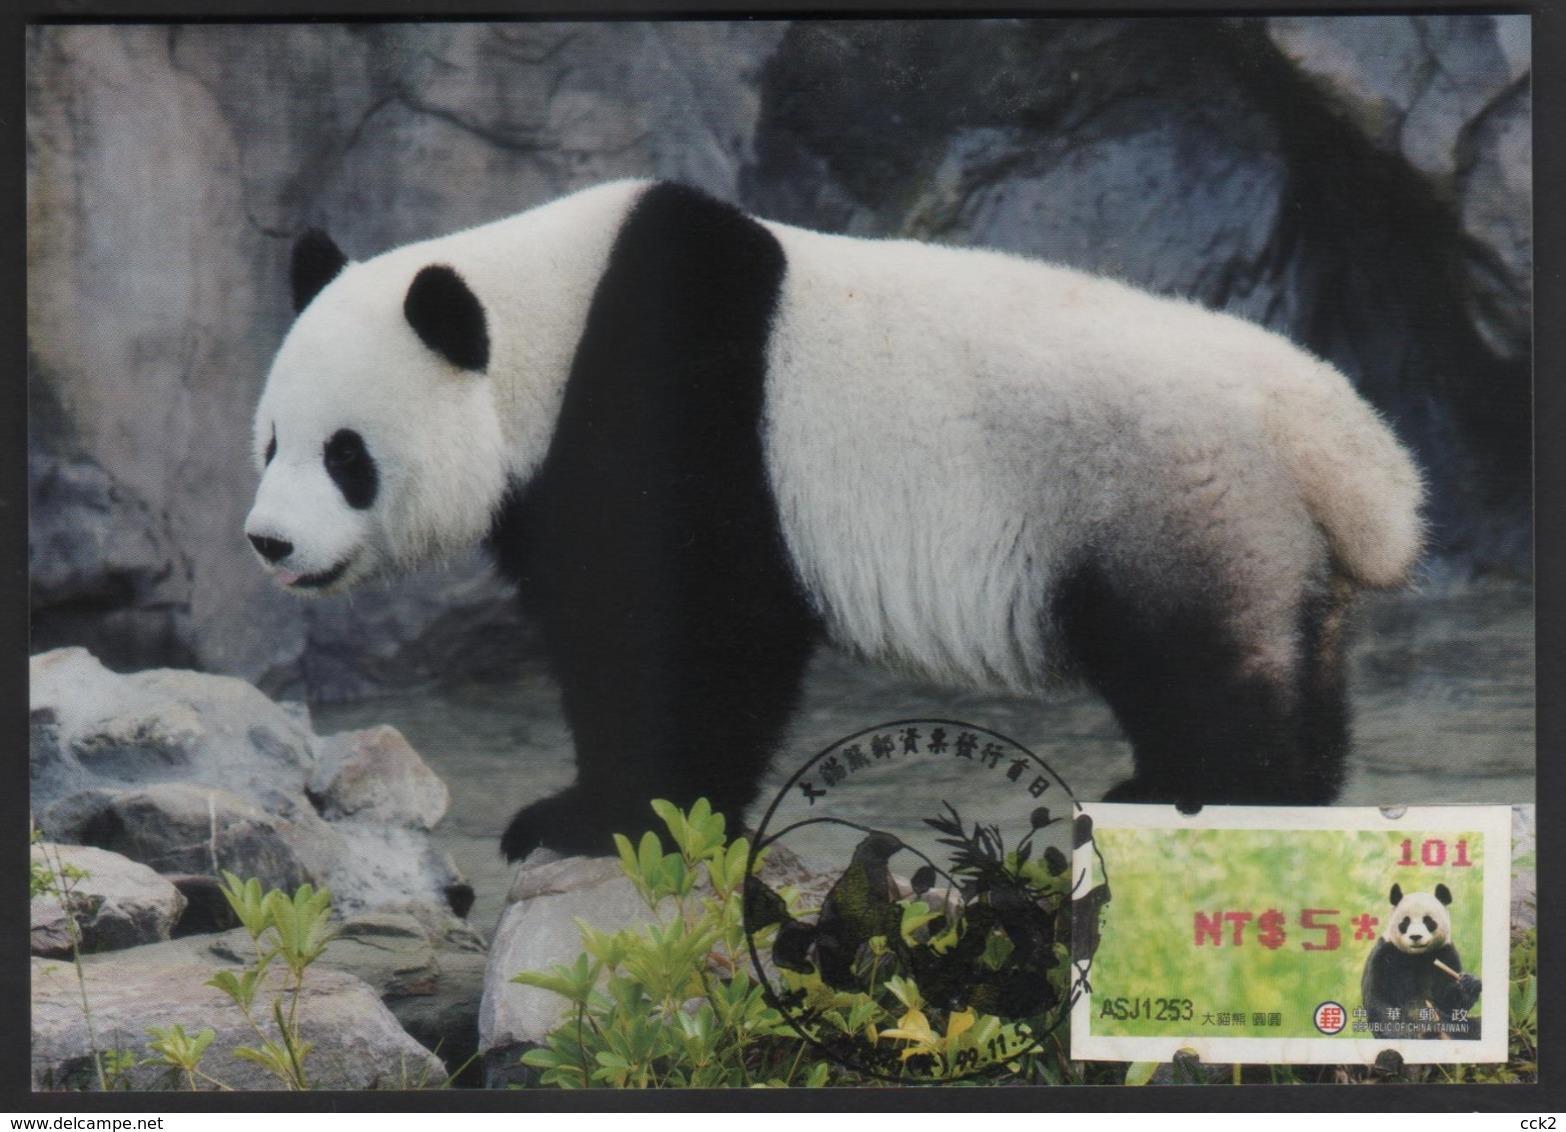 Taiwan(Formosa) Carte Maximum Card -Giant Panda ATM Label #101 Red Imprint - ATM - Frama (vignette)